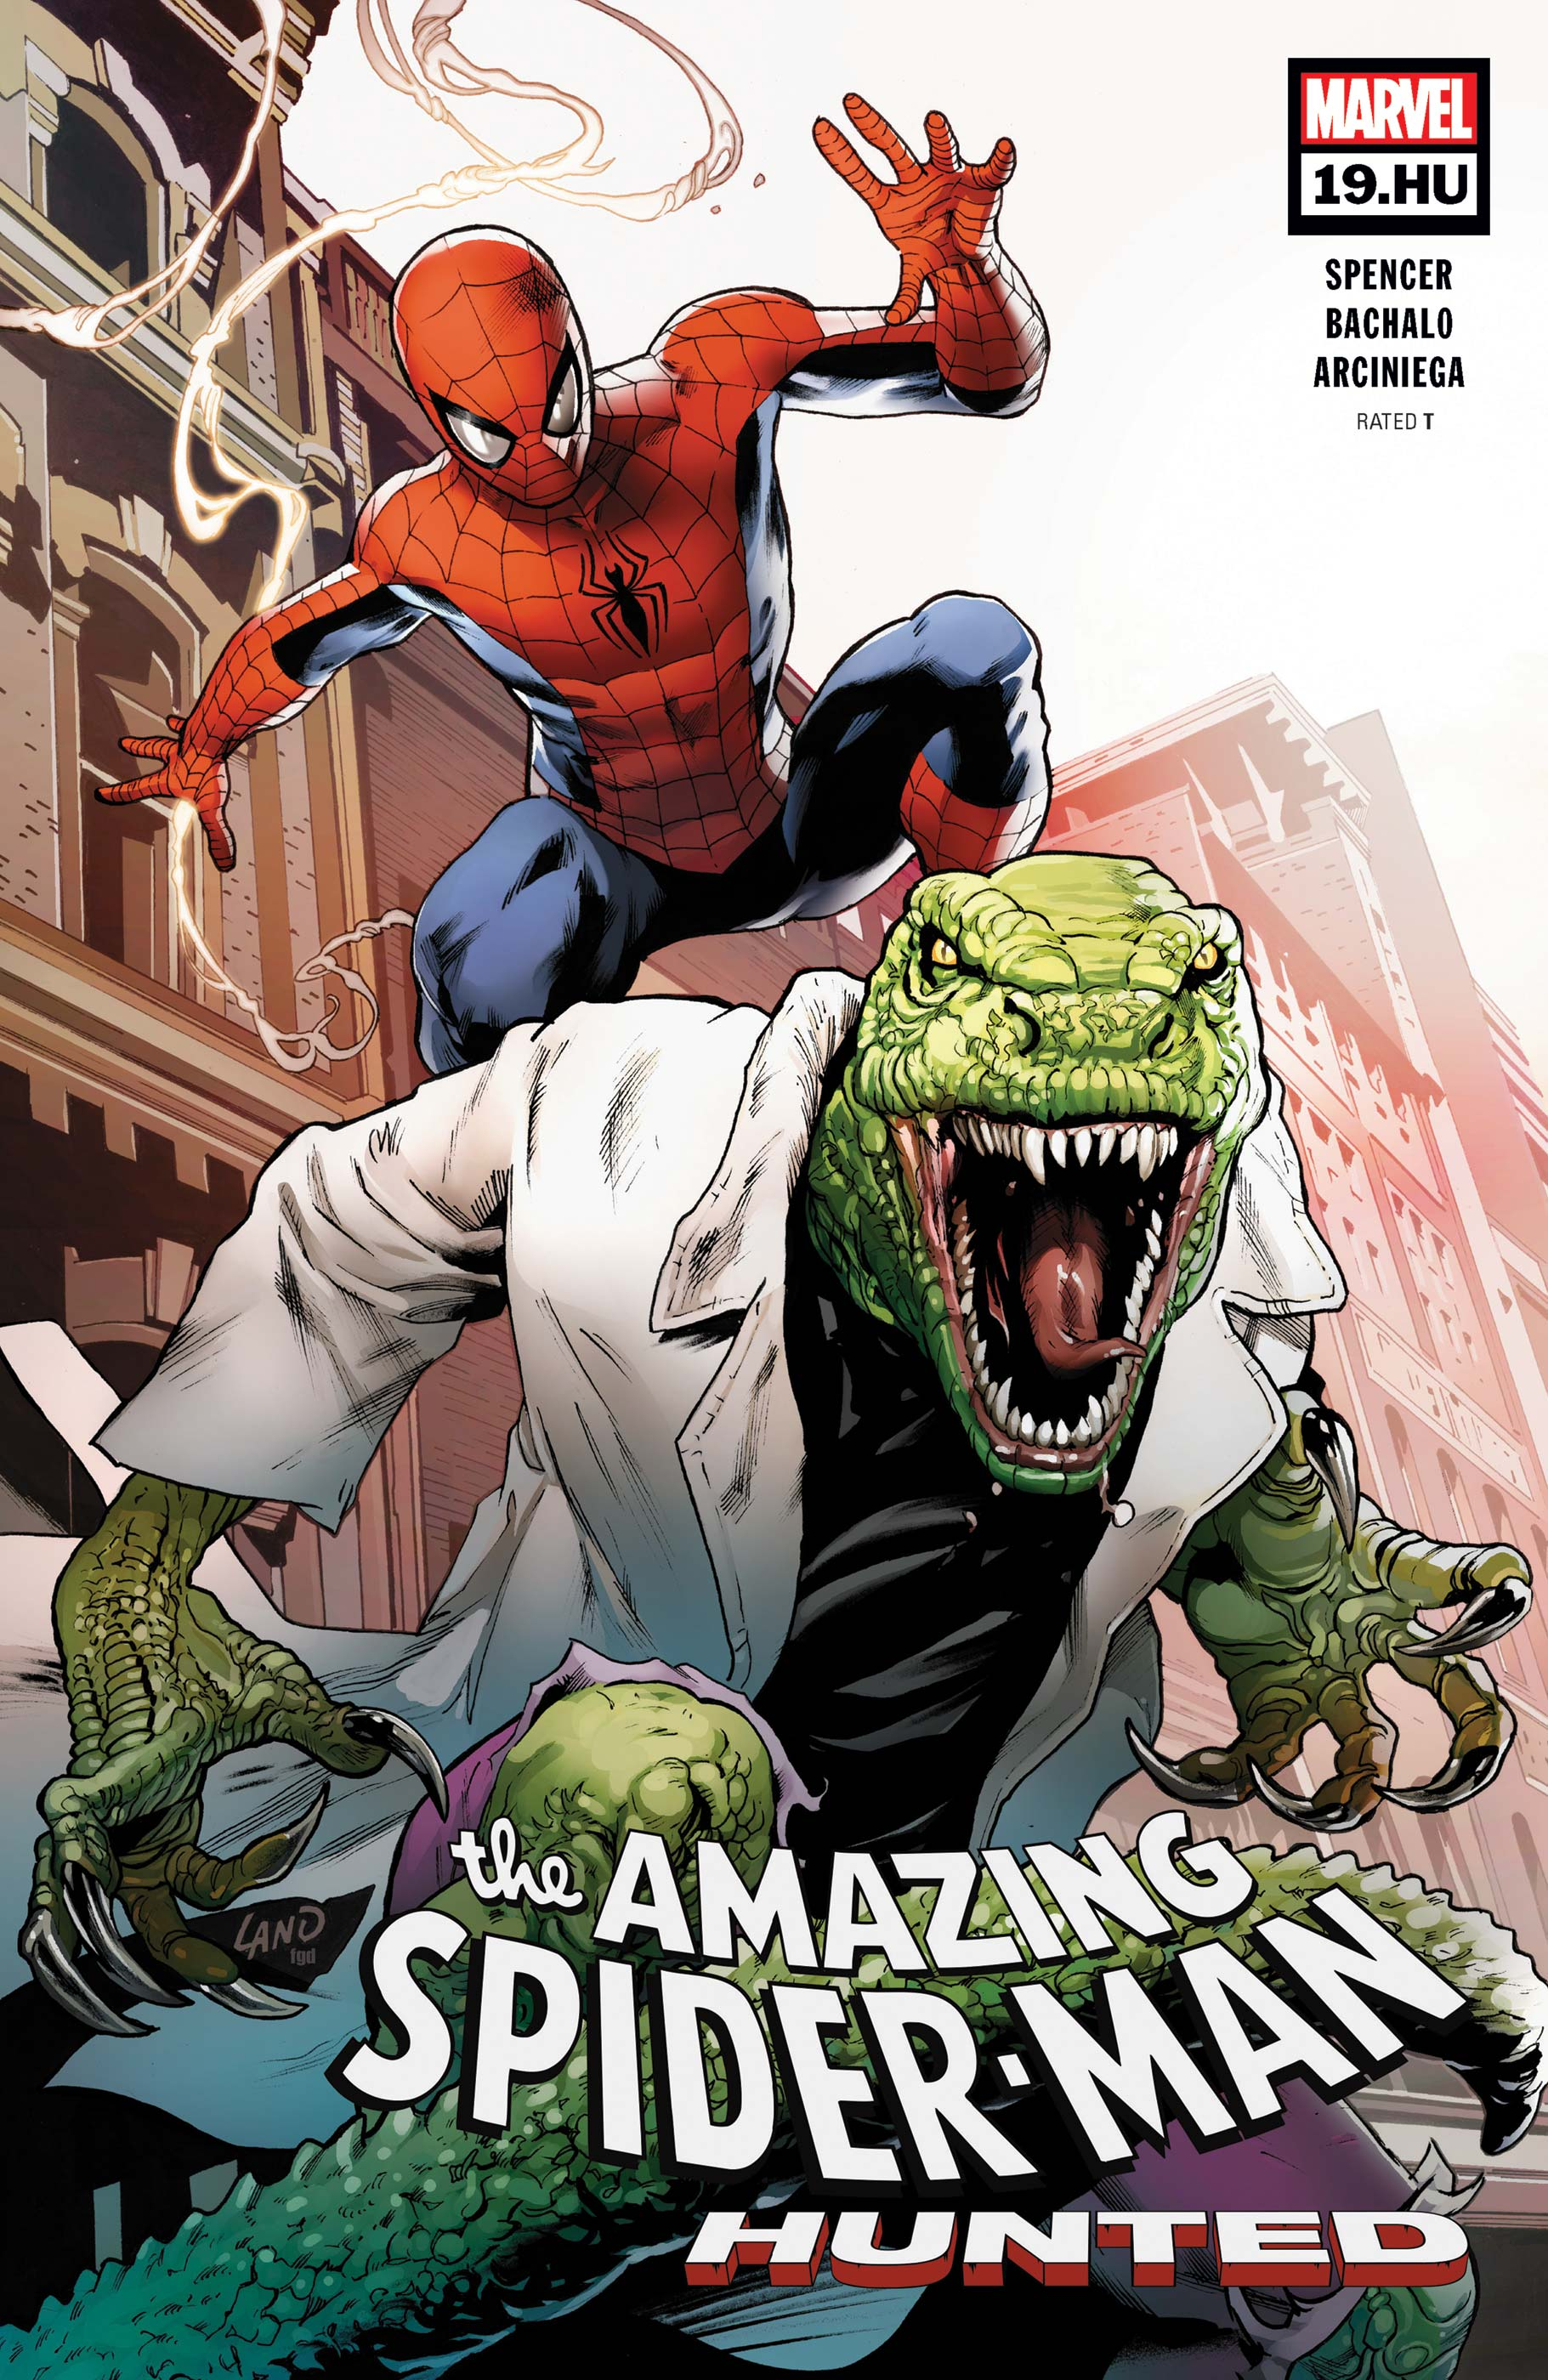 The Amazing Spider-Man (2018) #19